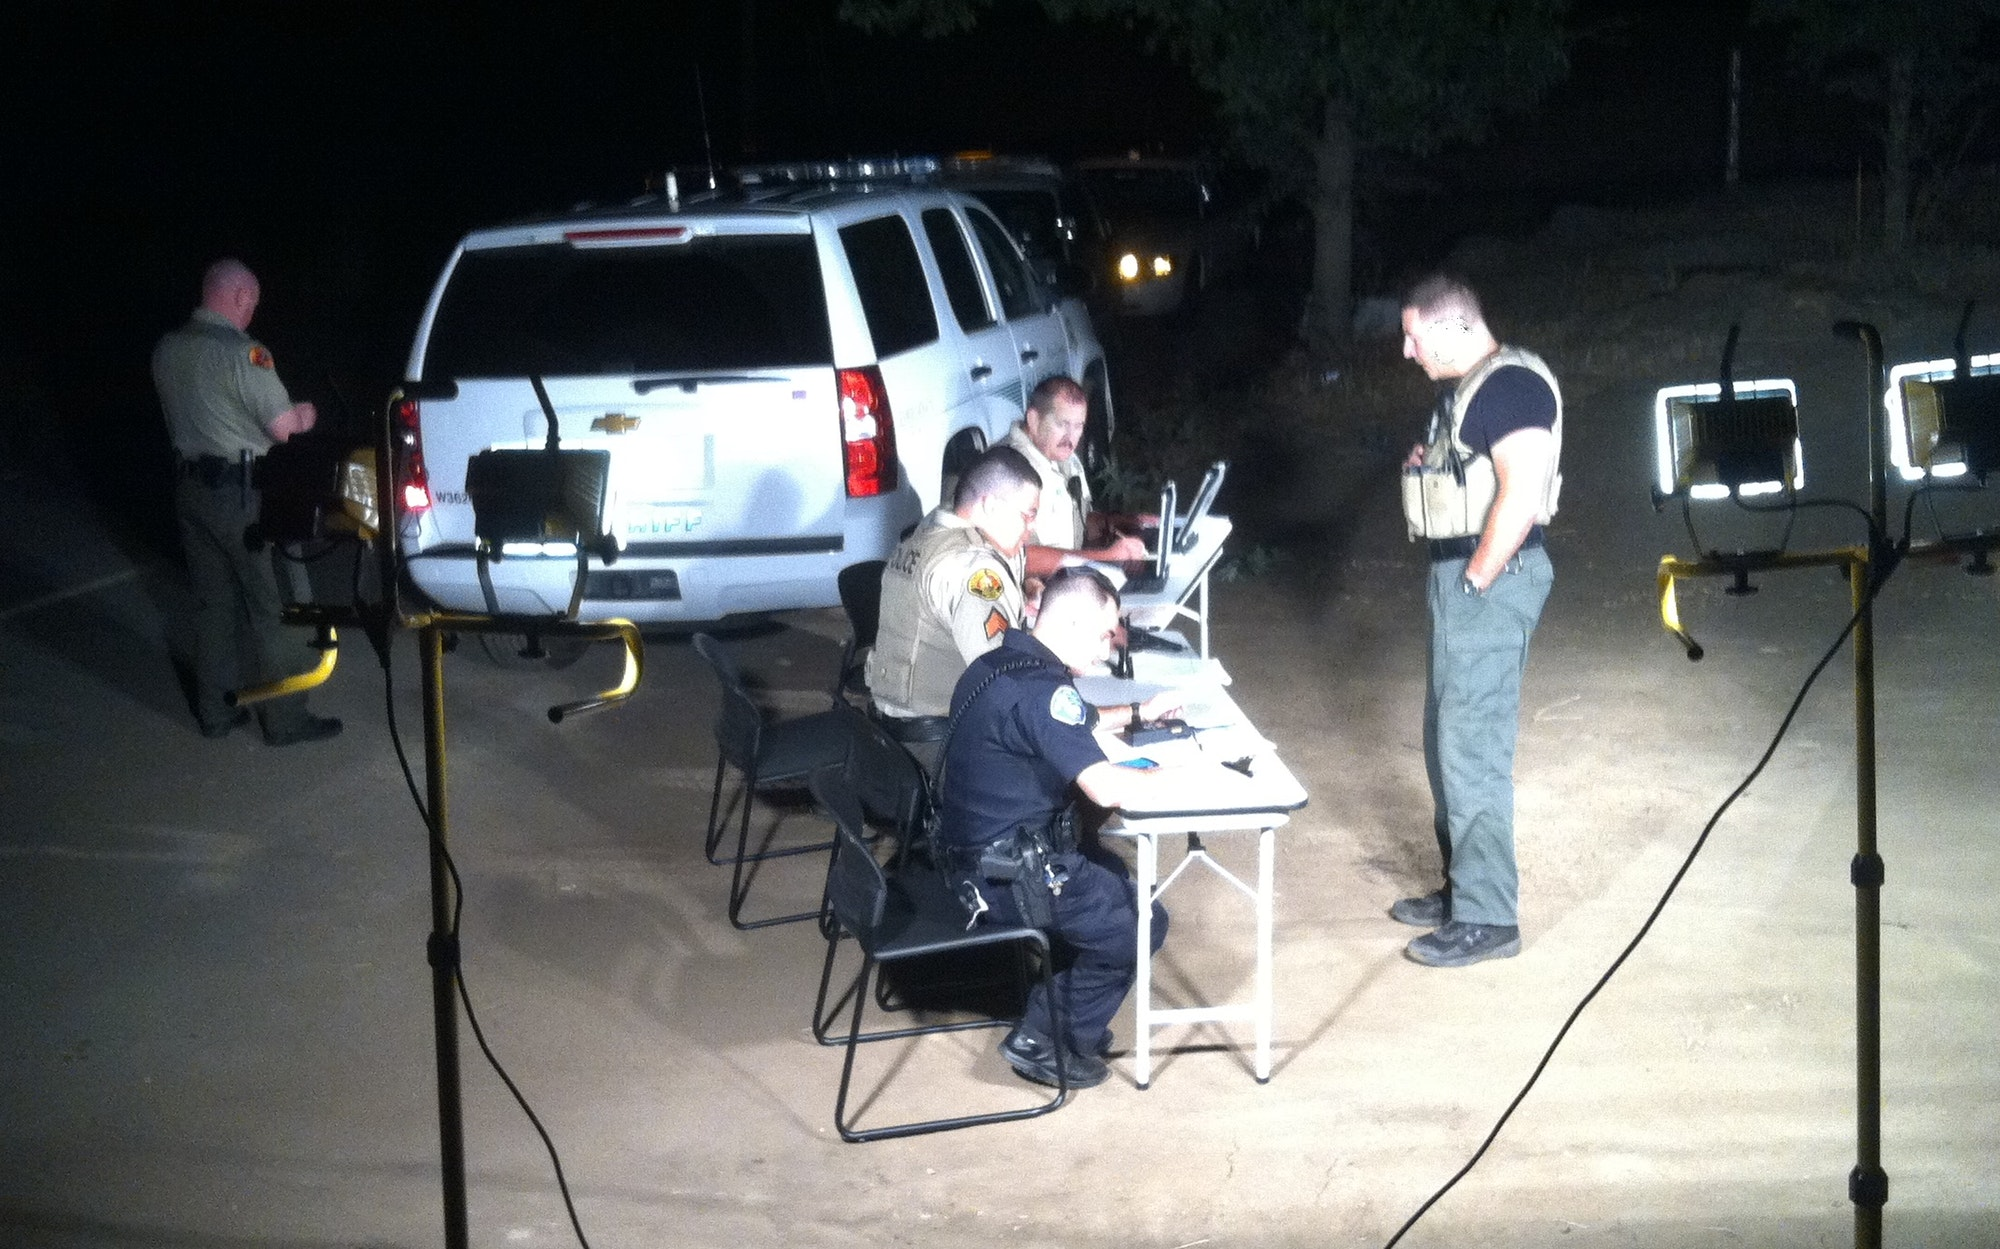 An impromtu outdoor command post set up by CERT members for SSPD during the High Gun fire. Thany you SS CERT!